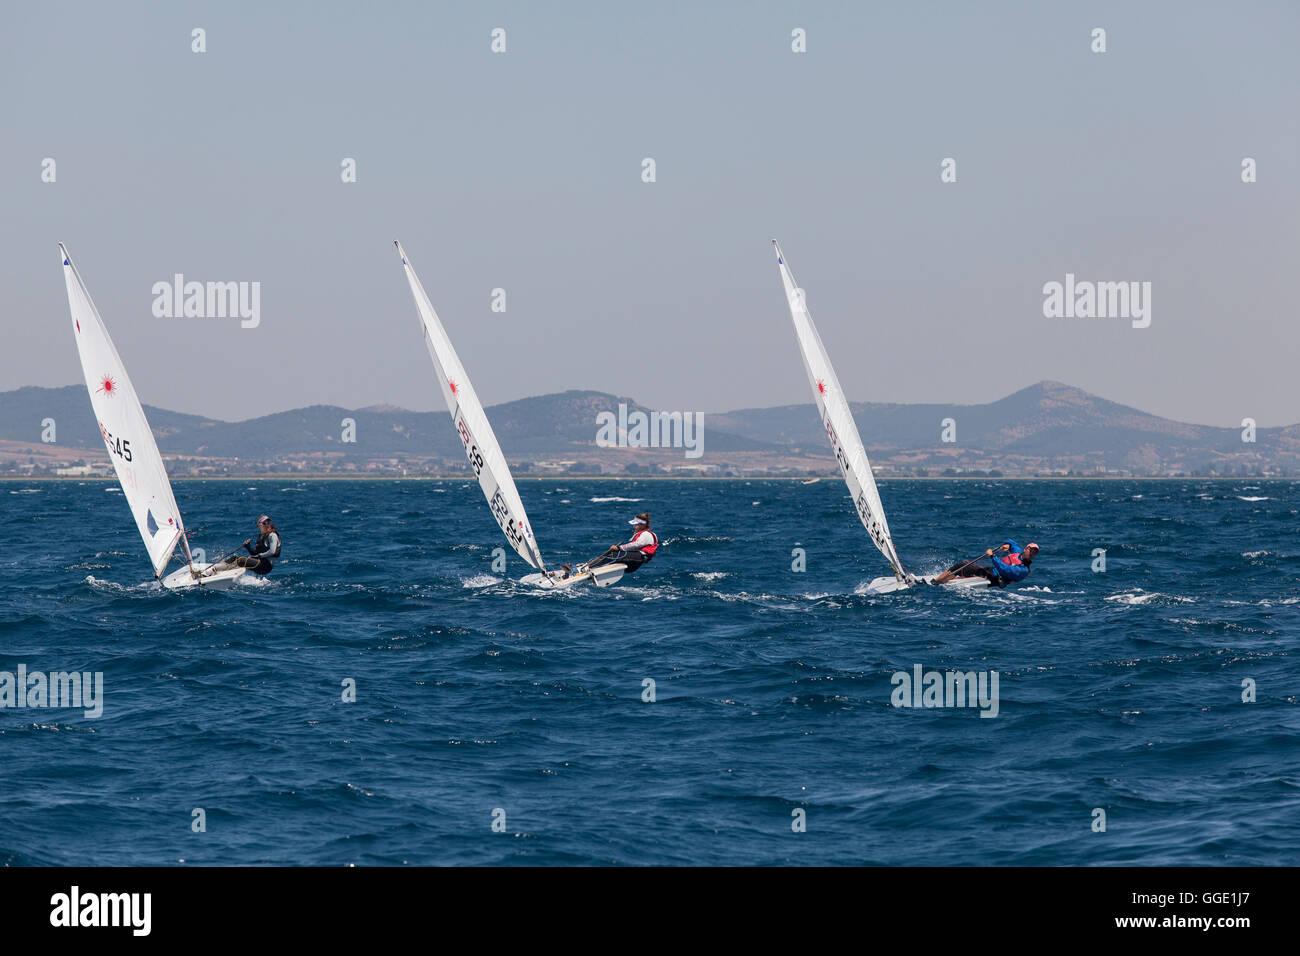 ALEXANDROUPOLI, GREECE - JULY 21: Sailing athletes at International Summer Regatta sailing action in Mediterranean - Stock Image